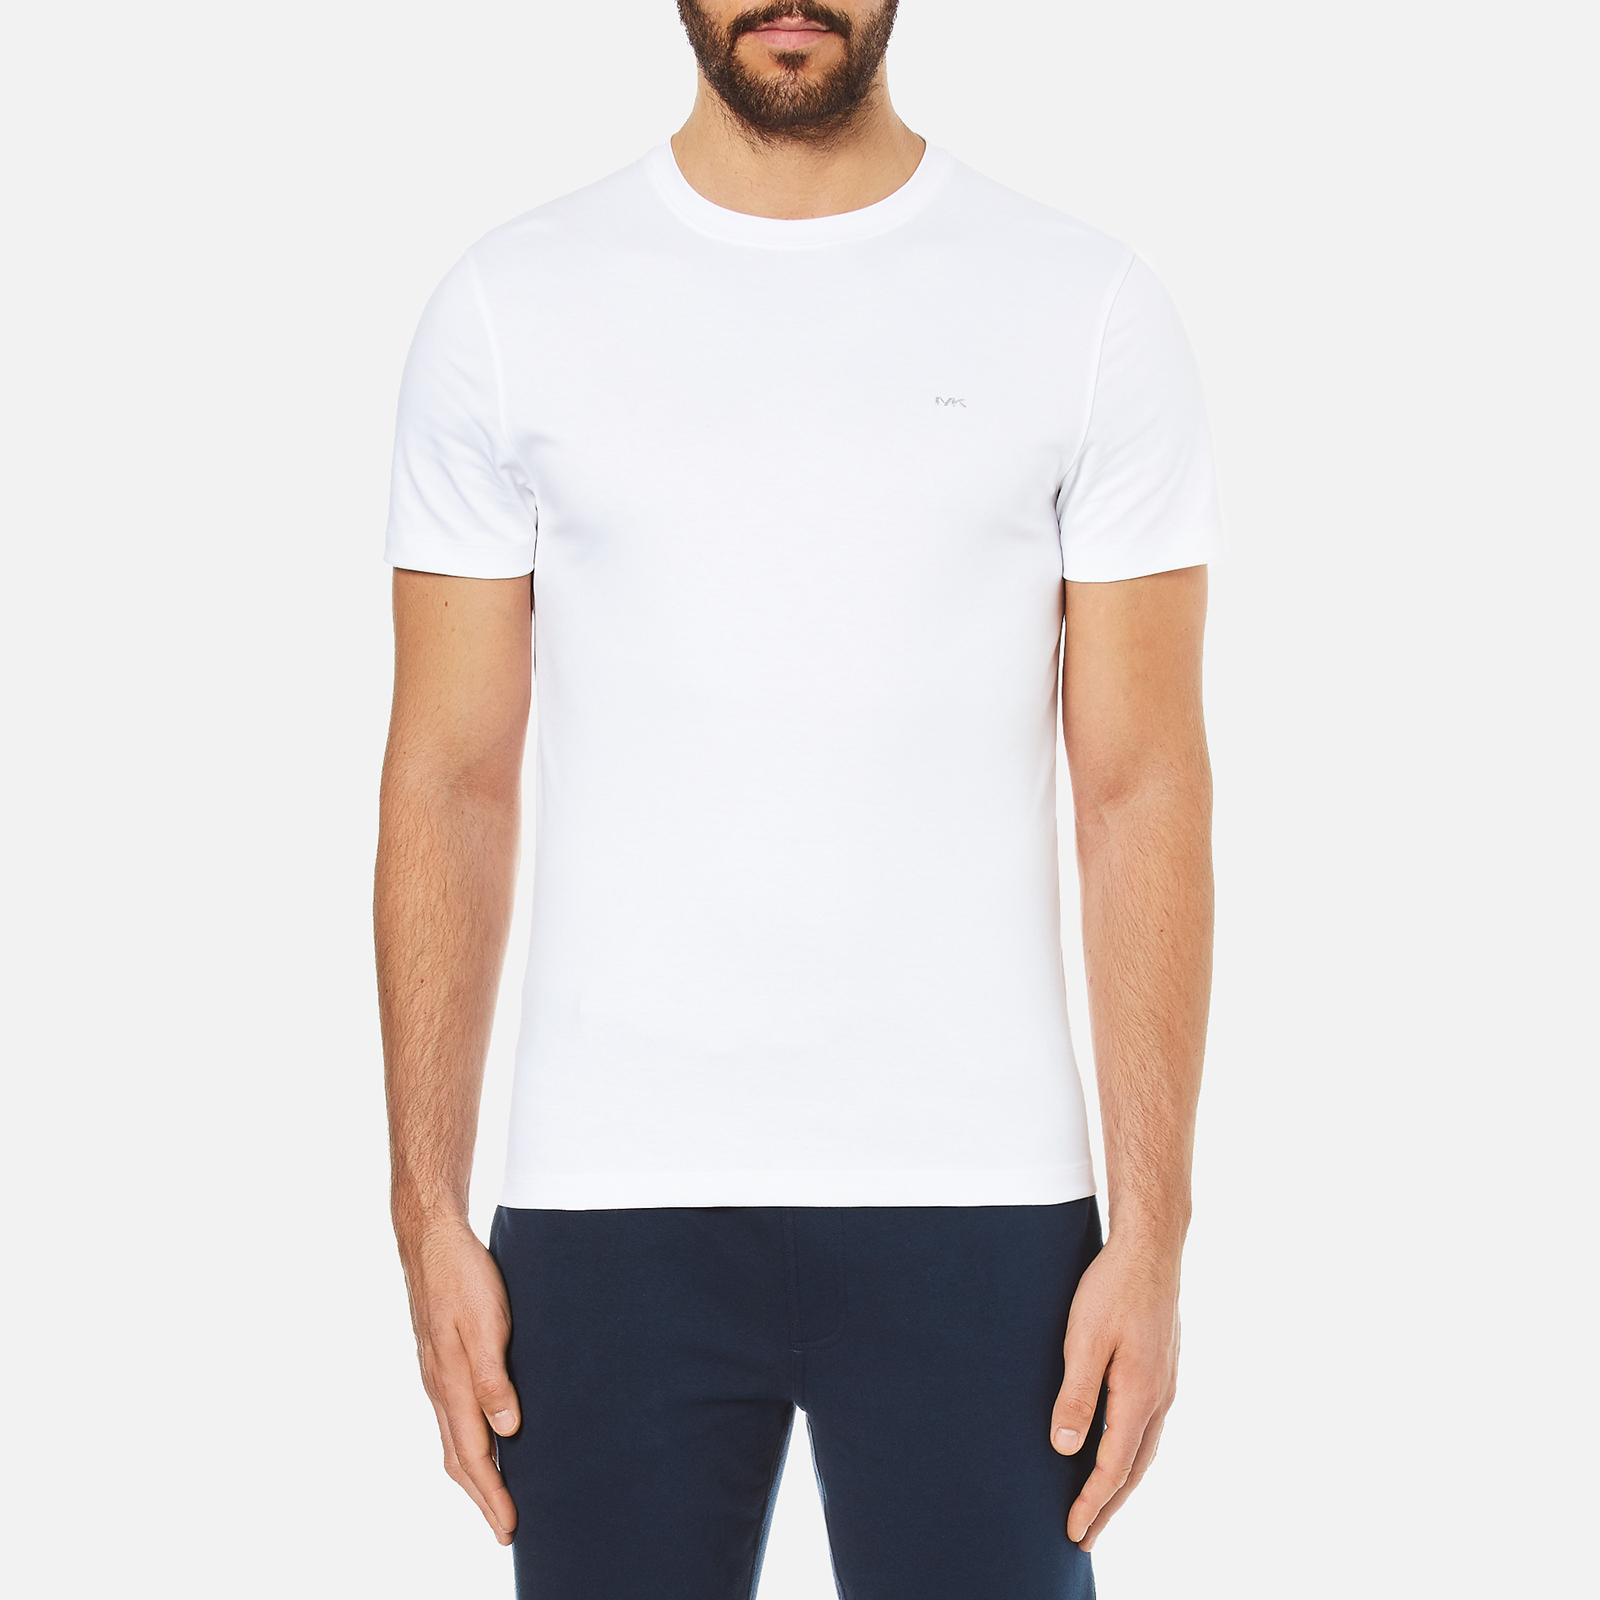 c03ddbfc1 Michael Kors Men's Liquid Jersey Crew Neck Short Sleeve T-Shirt - White -  Free UK Delivery over £50